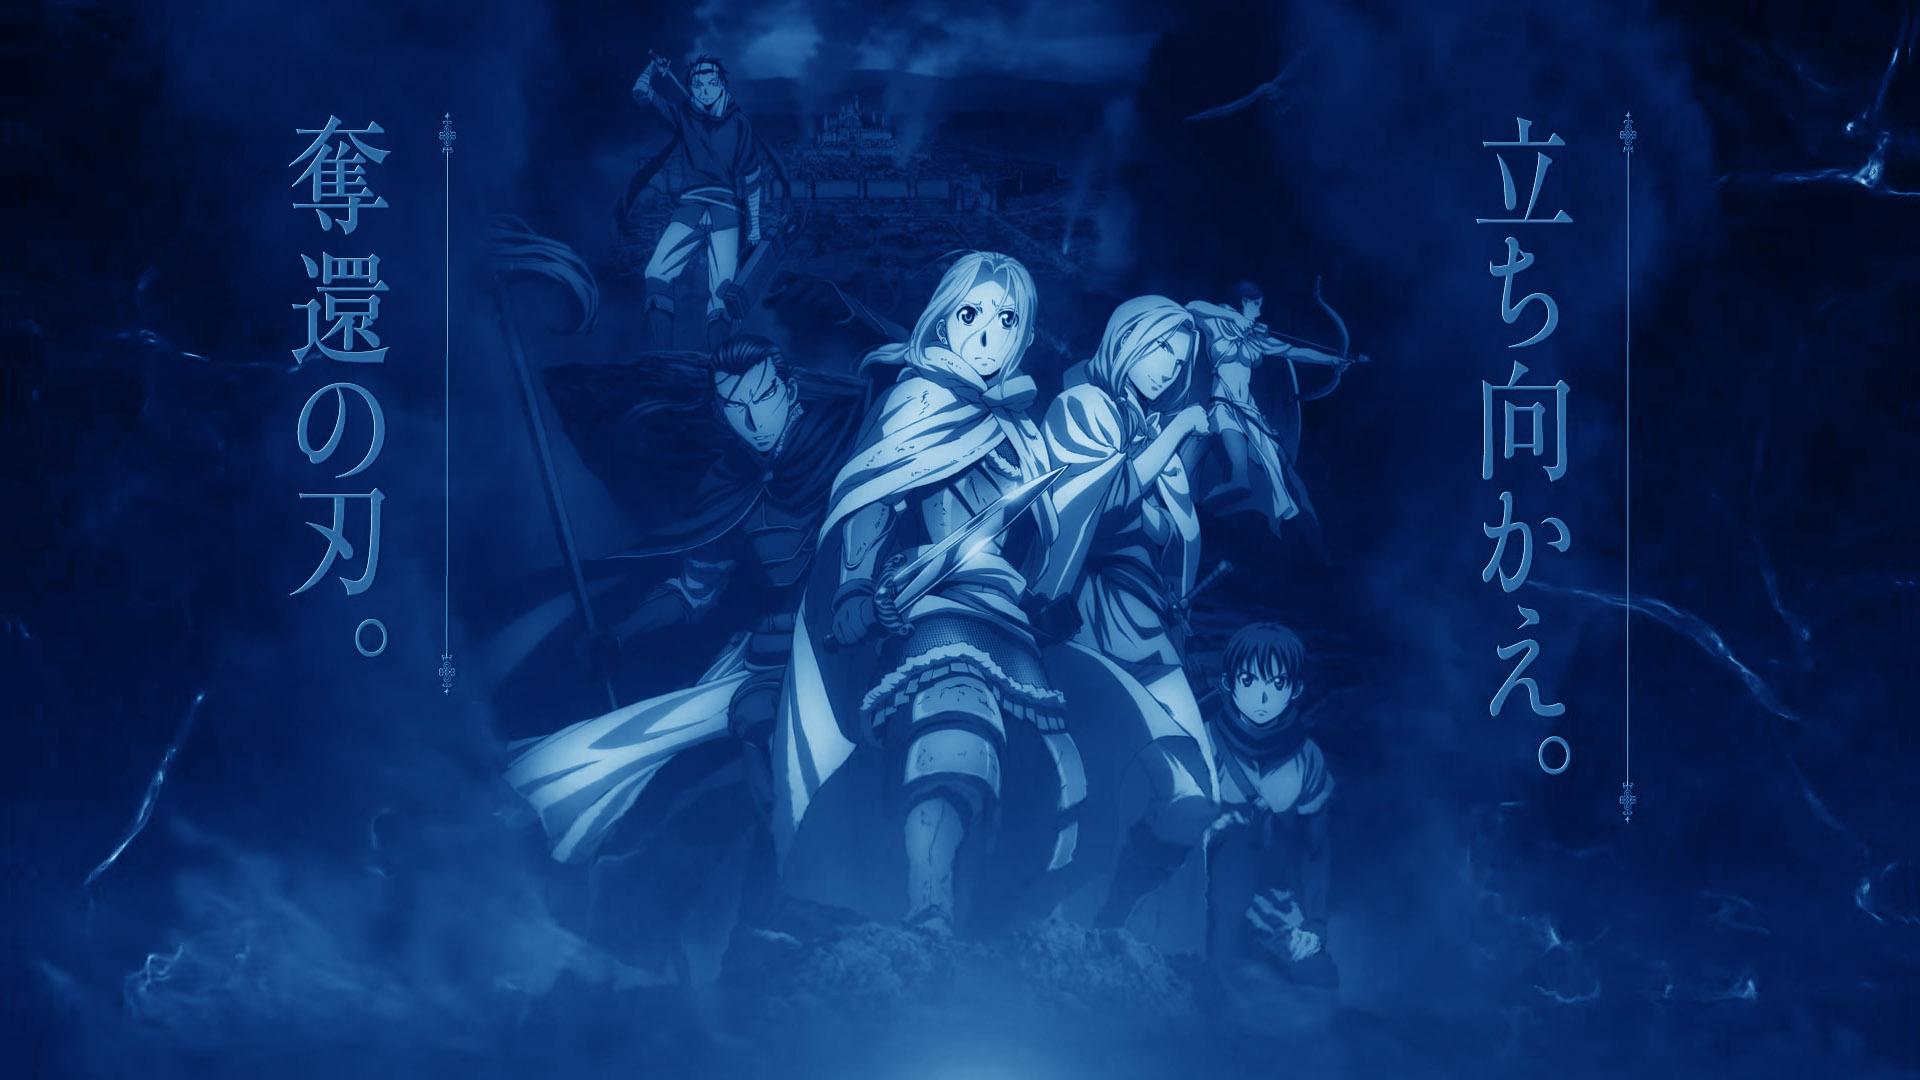 The Heroic Legend Of Arslan (original Novel)  The Heroic Legend Of Arslan  Wiki  Fandom Powered By Wikia